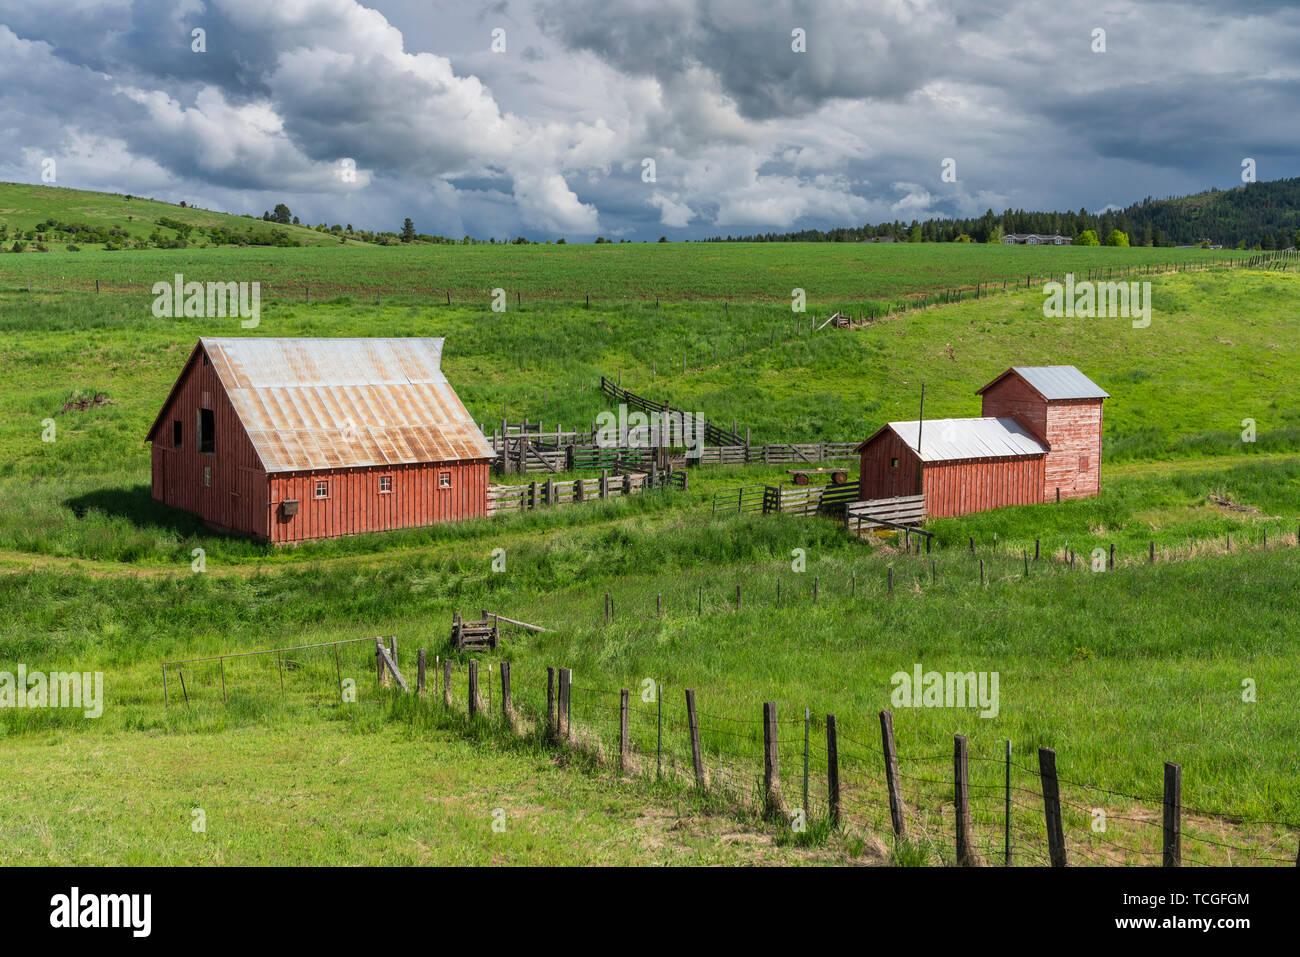 Red farm barns in a valley near Grangeville, Idaho, USA. America. - Stock Image